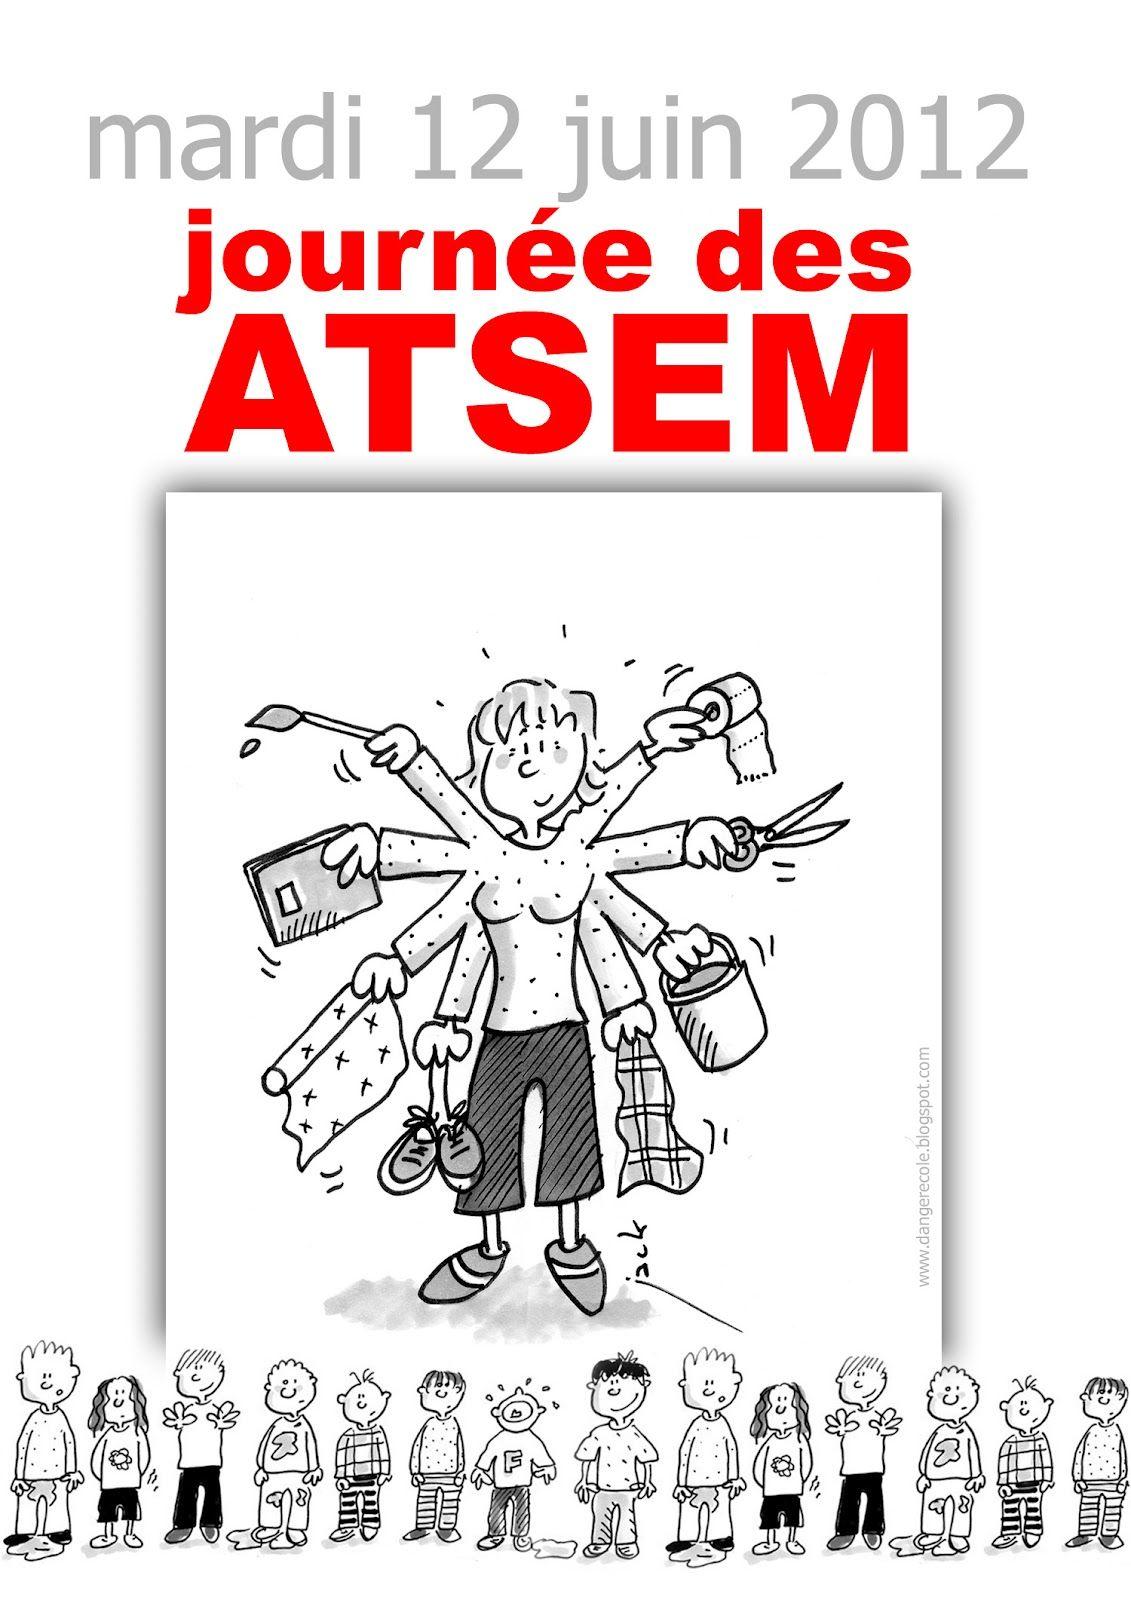 12 Juin Journee Des Atsem Organiser Preparer Et Gerer Une Classe En Maternelle Forums Enseignants Du Primaire Atsem Danger Ecole Comptine Maternelle